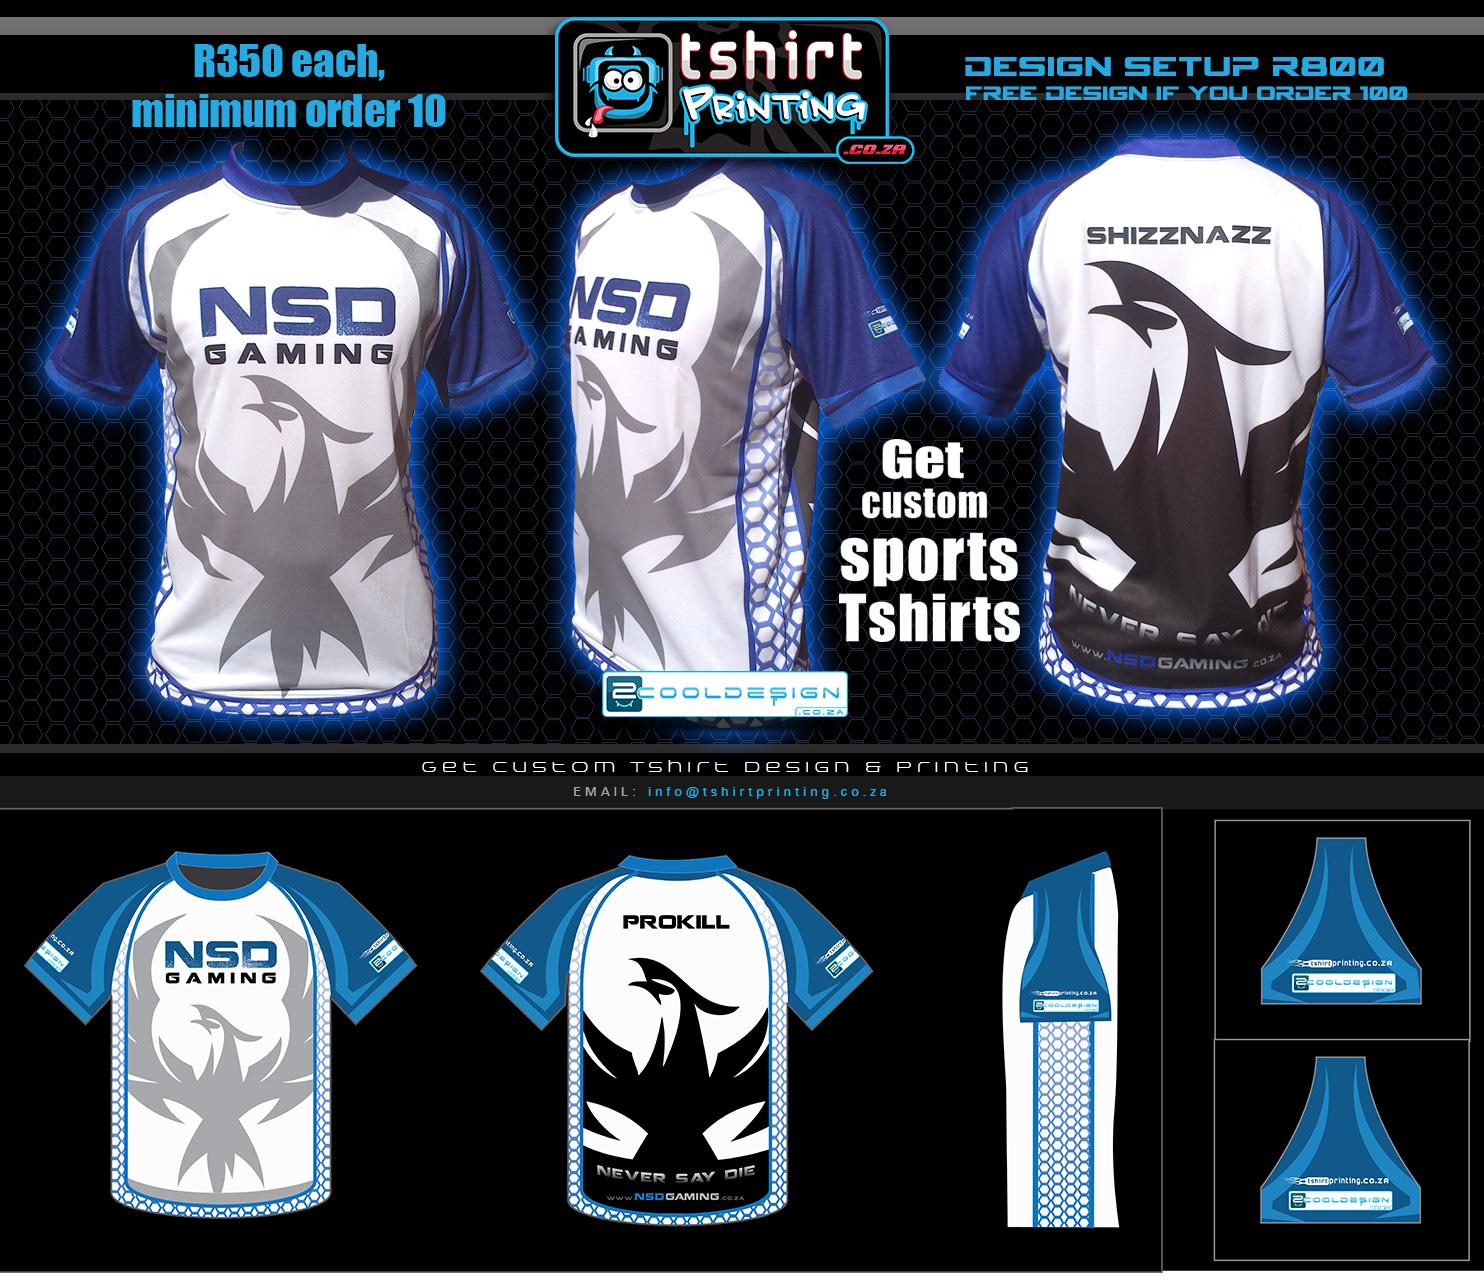 cool gamer shirt design 2014